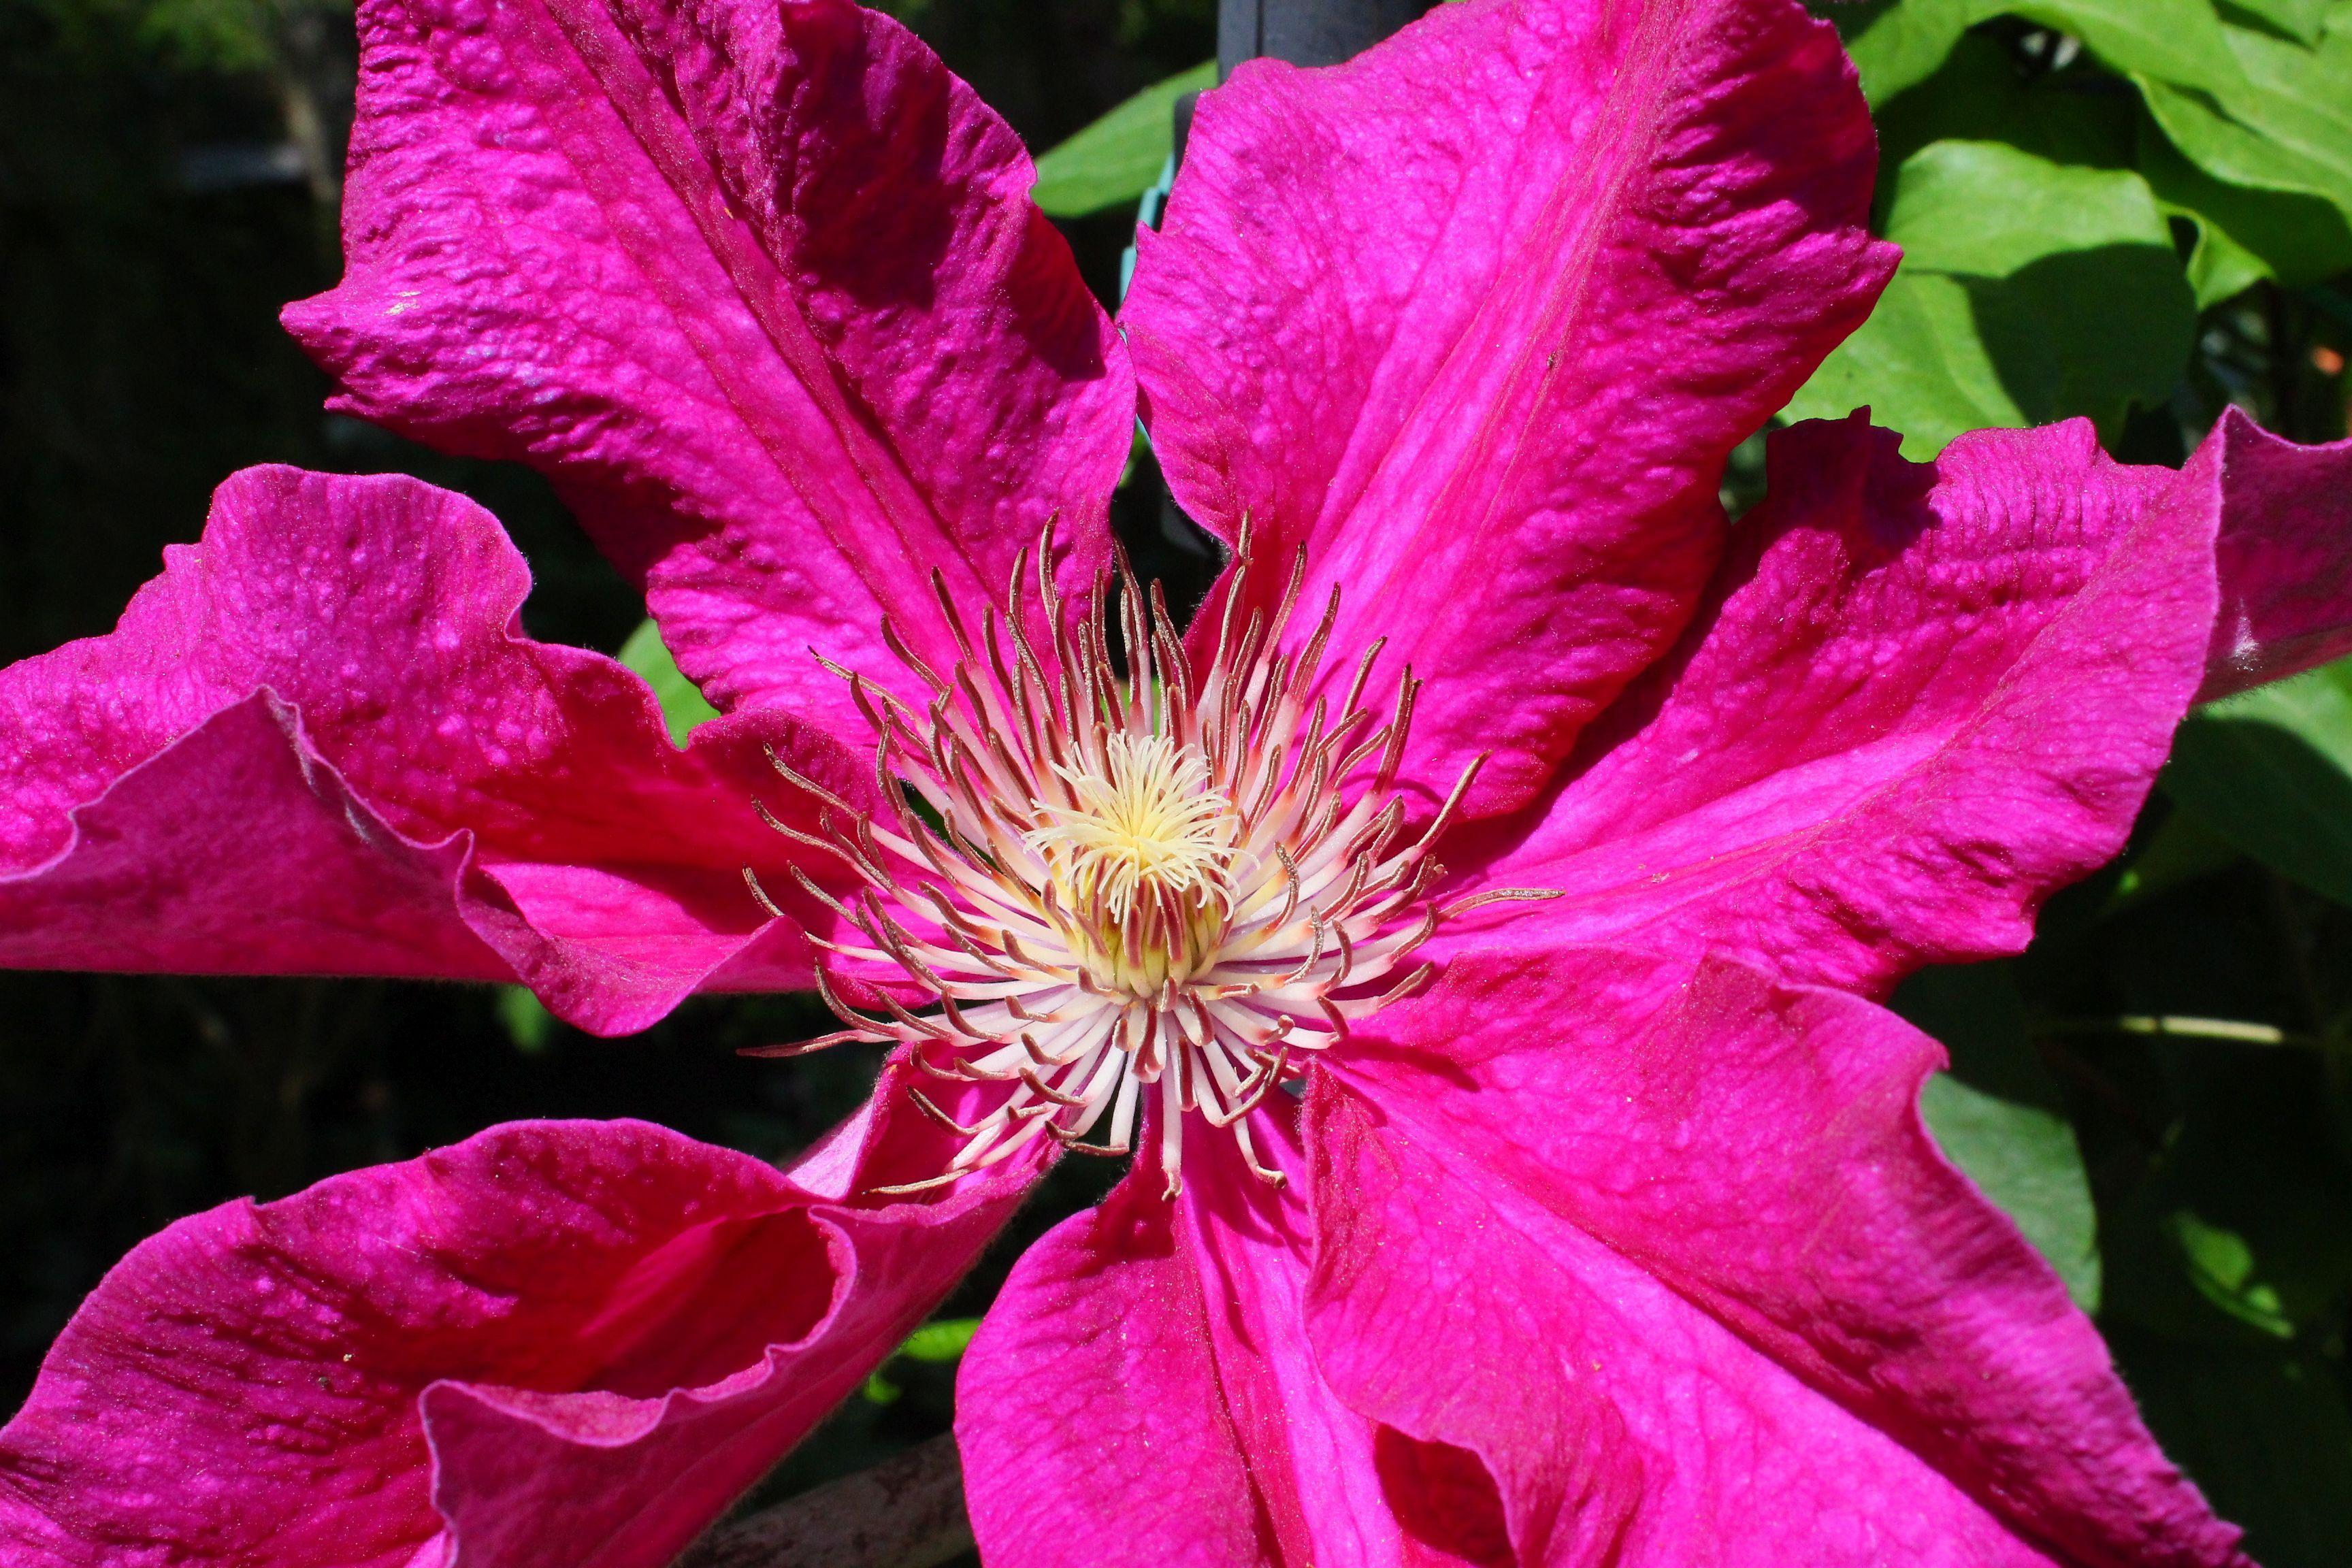 Pin by lynn vos on flowers pinterest flowers